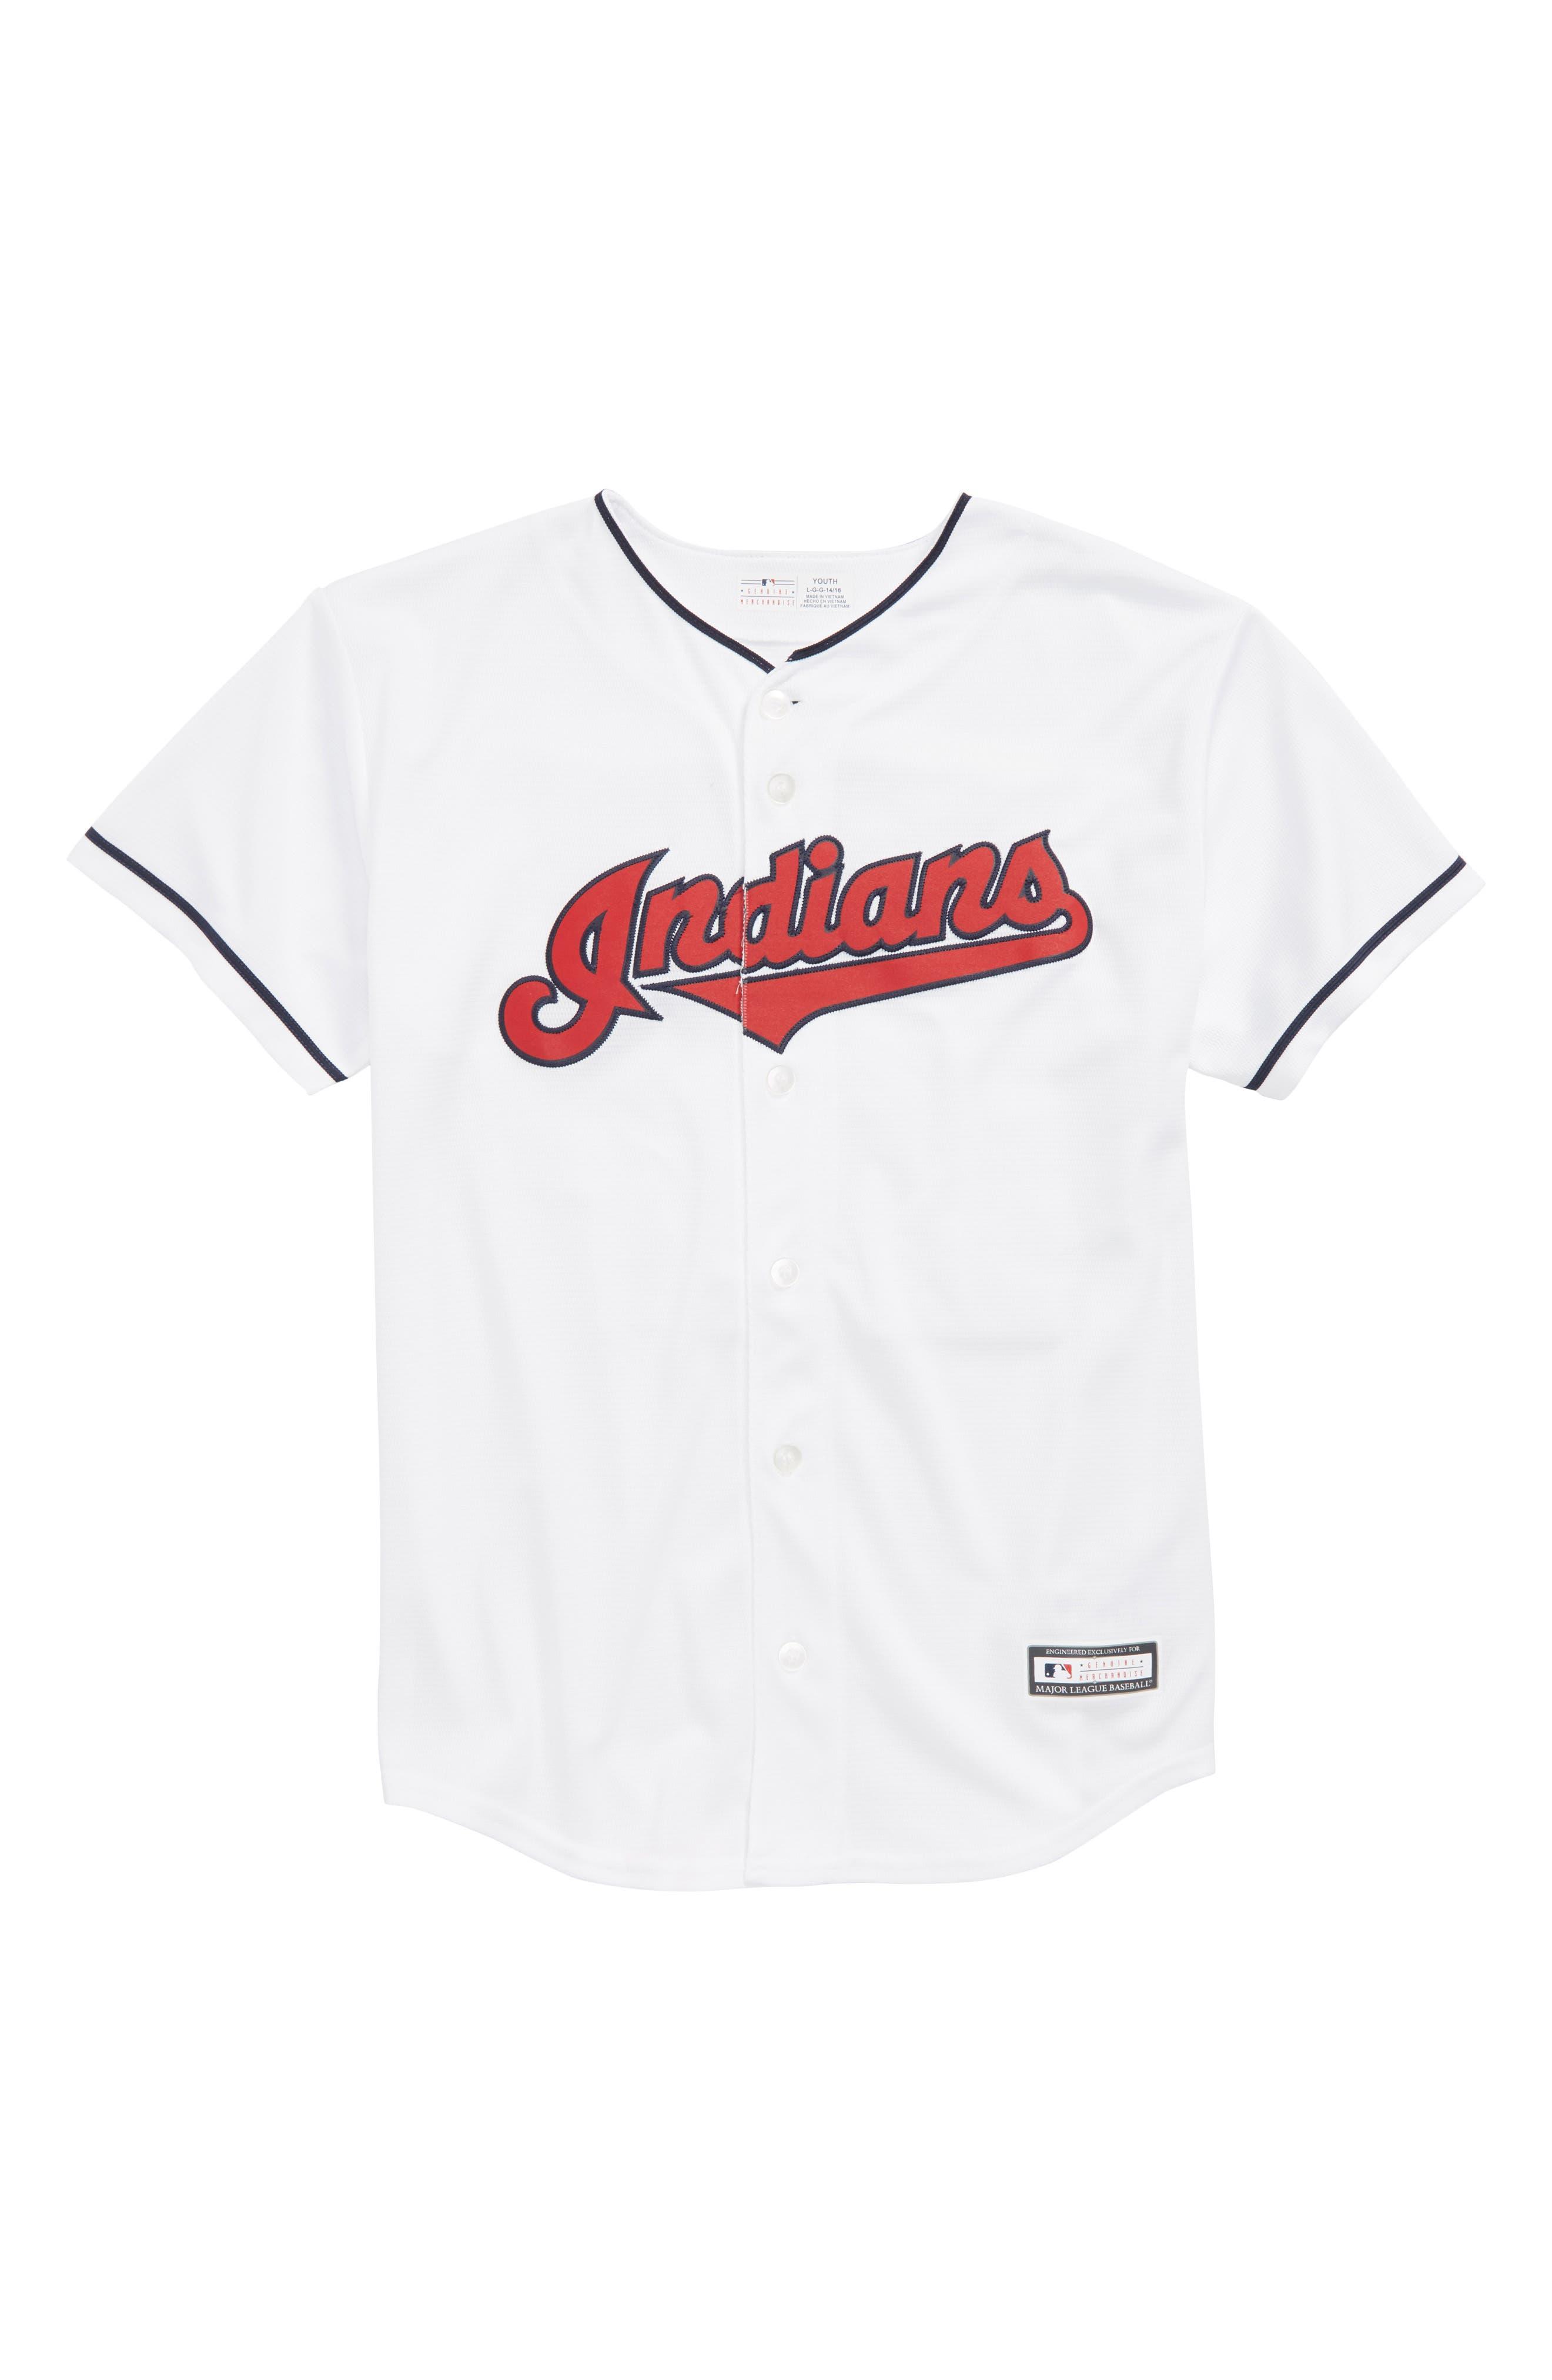 Cleveland Indians - Francisco Lindor Baseball Jersey,                             Main thumbnail 1, color,                             White